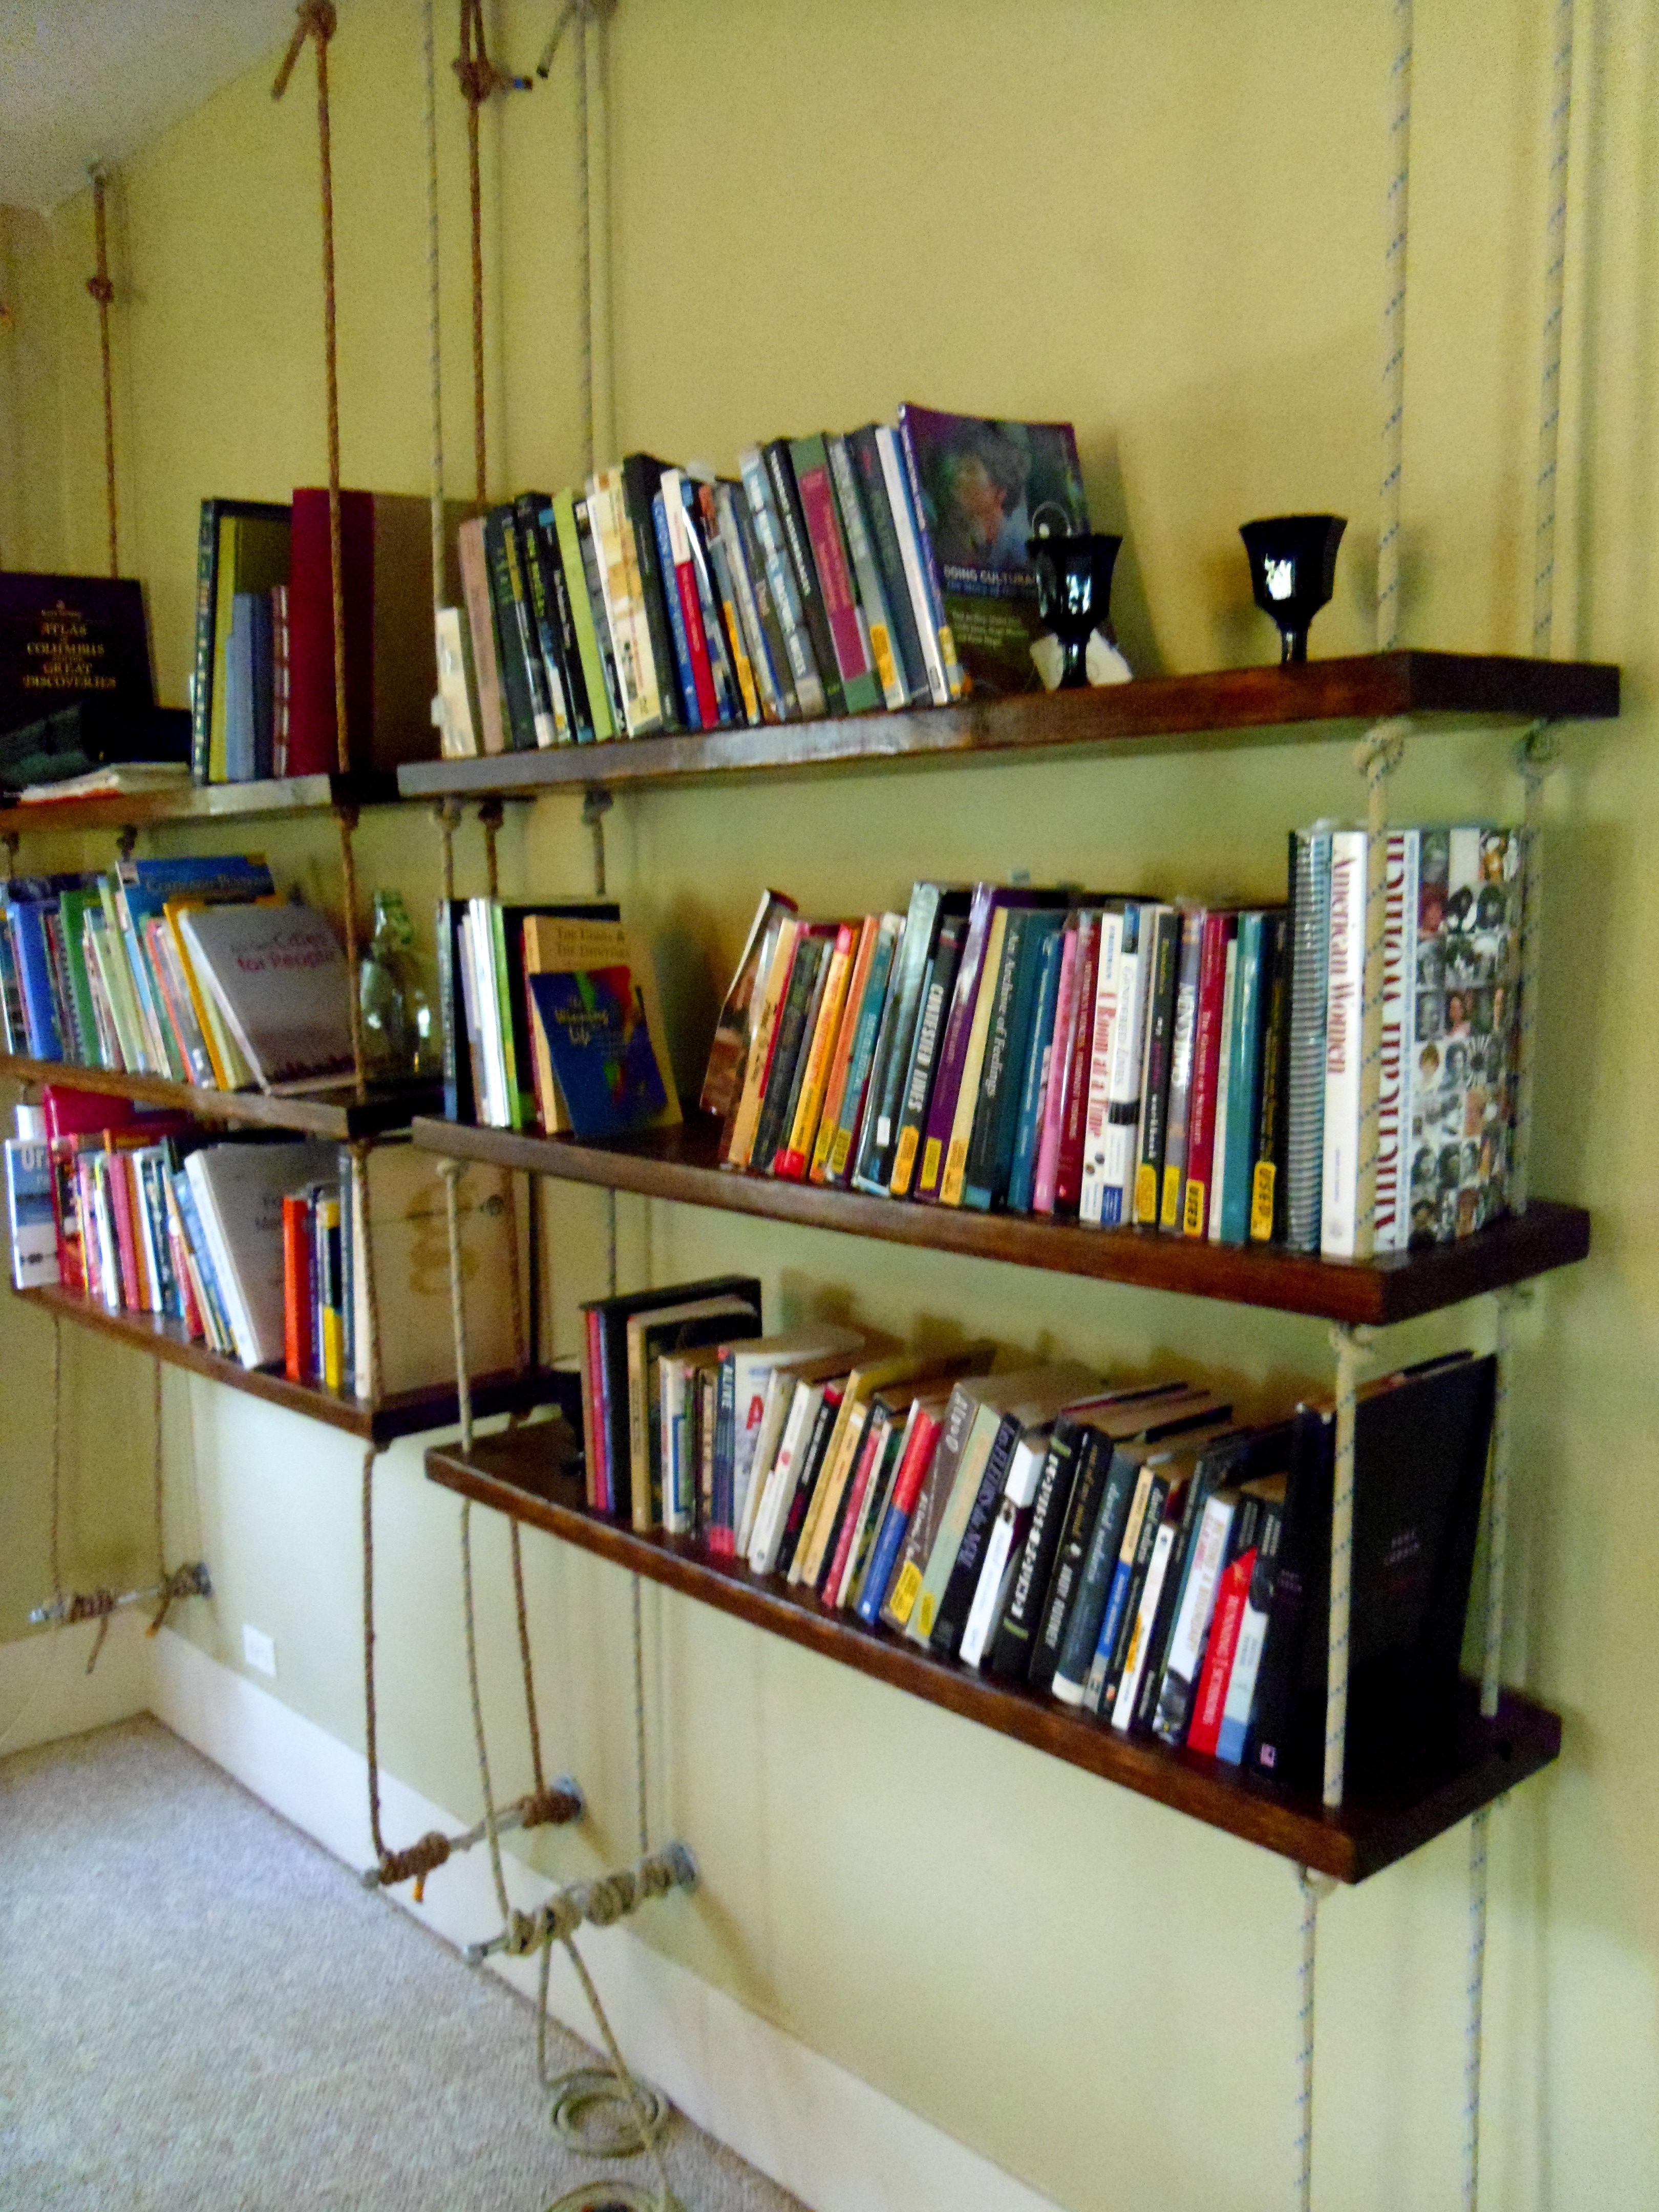 Hanging Bookshelves Hanging Bookshelves Climbing Rope And - Diy build industrial hanging shelf